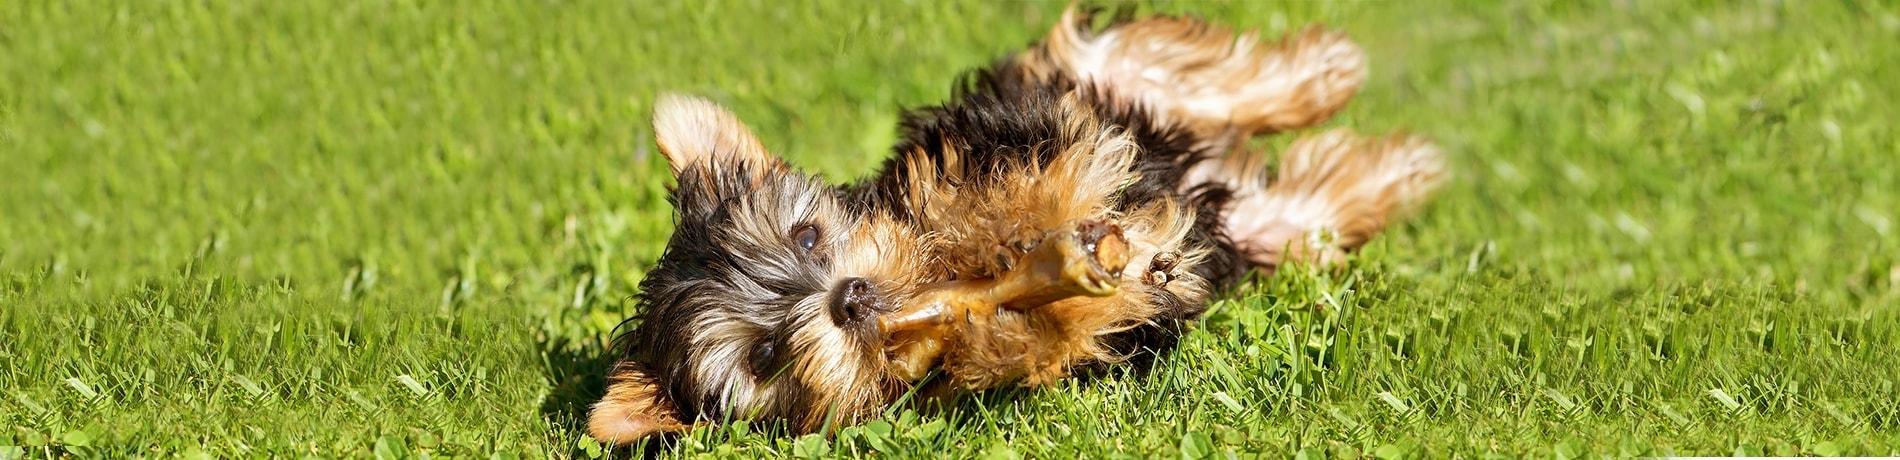 puppy benodigdheden